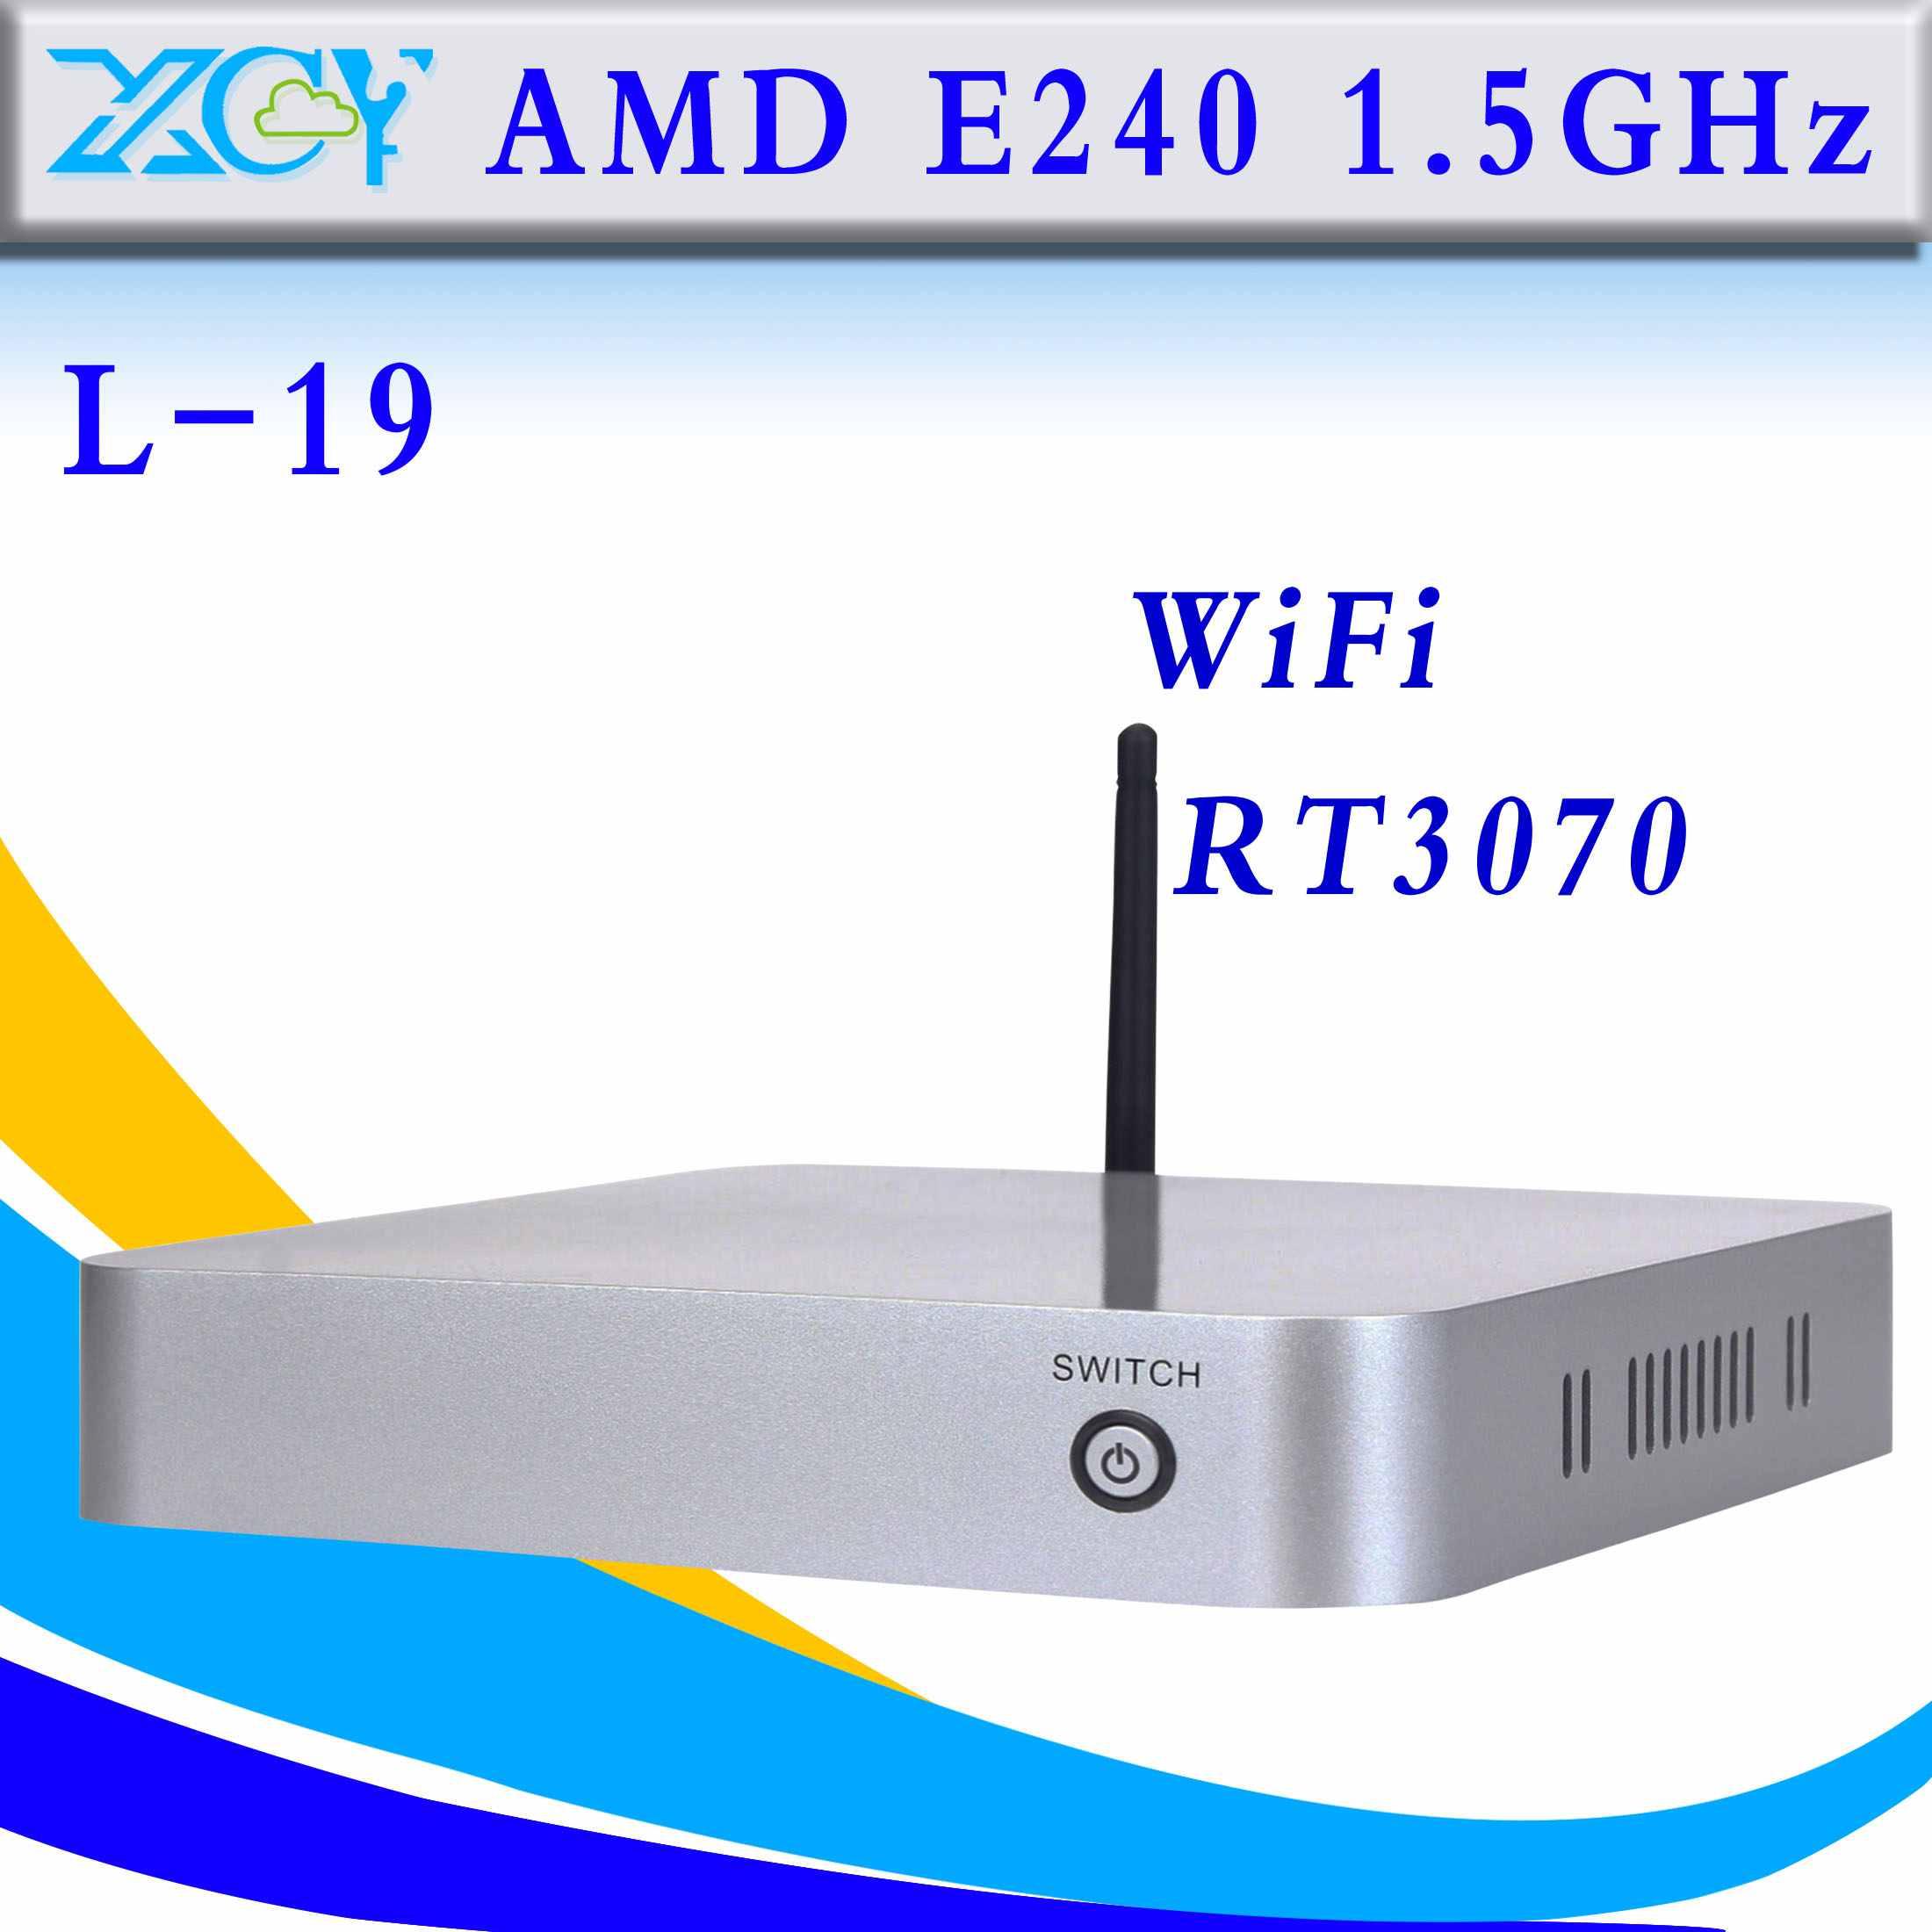 highend thin client XCY L-19 AMD E240 Mini PC with wifi 4*USB2.0,1*HDMI 1.3,1*VAG,1*DC-IN jack, 1*RJ 45Lan port(China (Mainland))